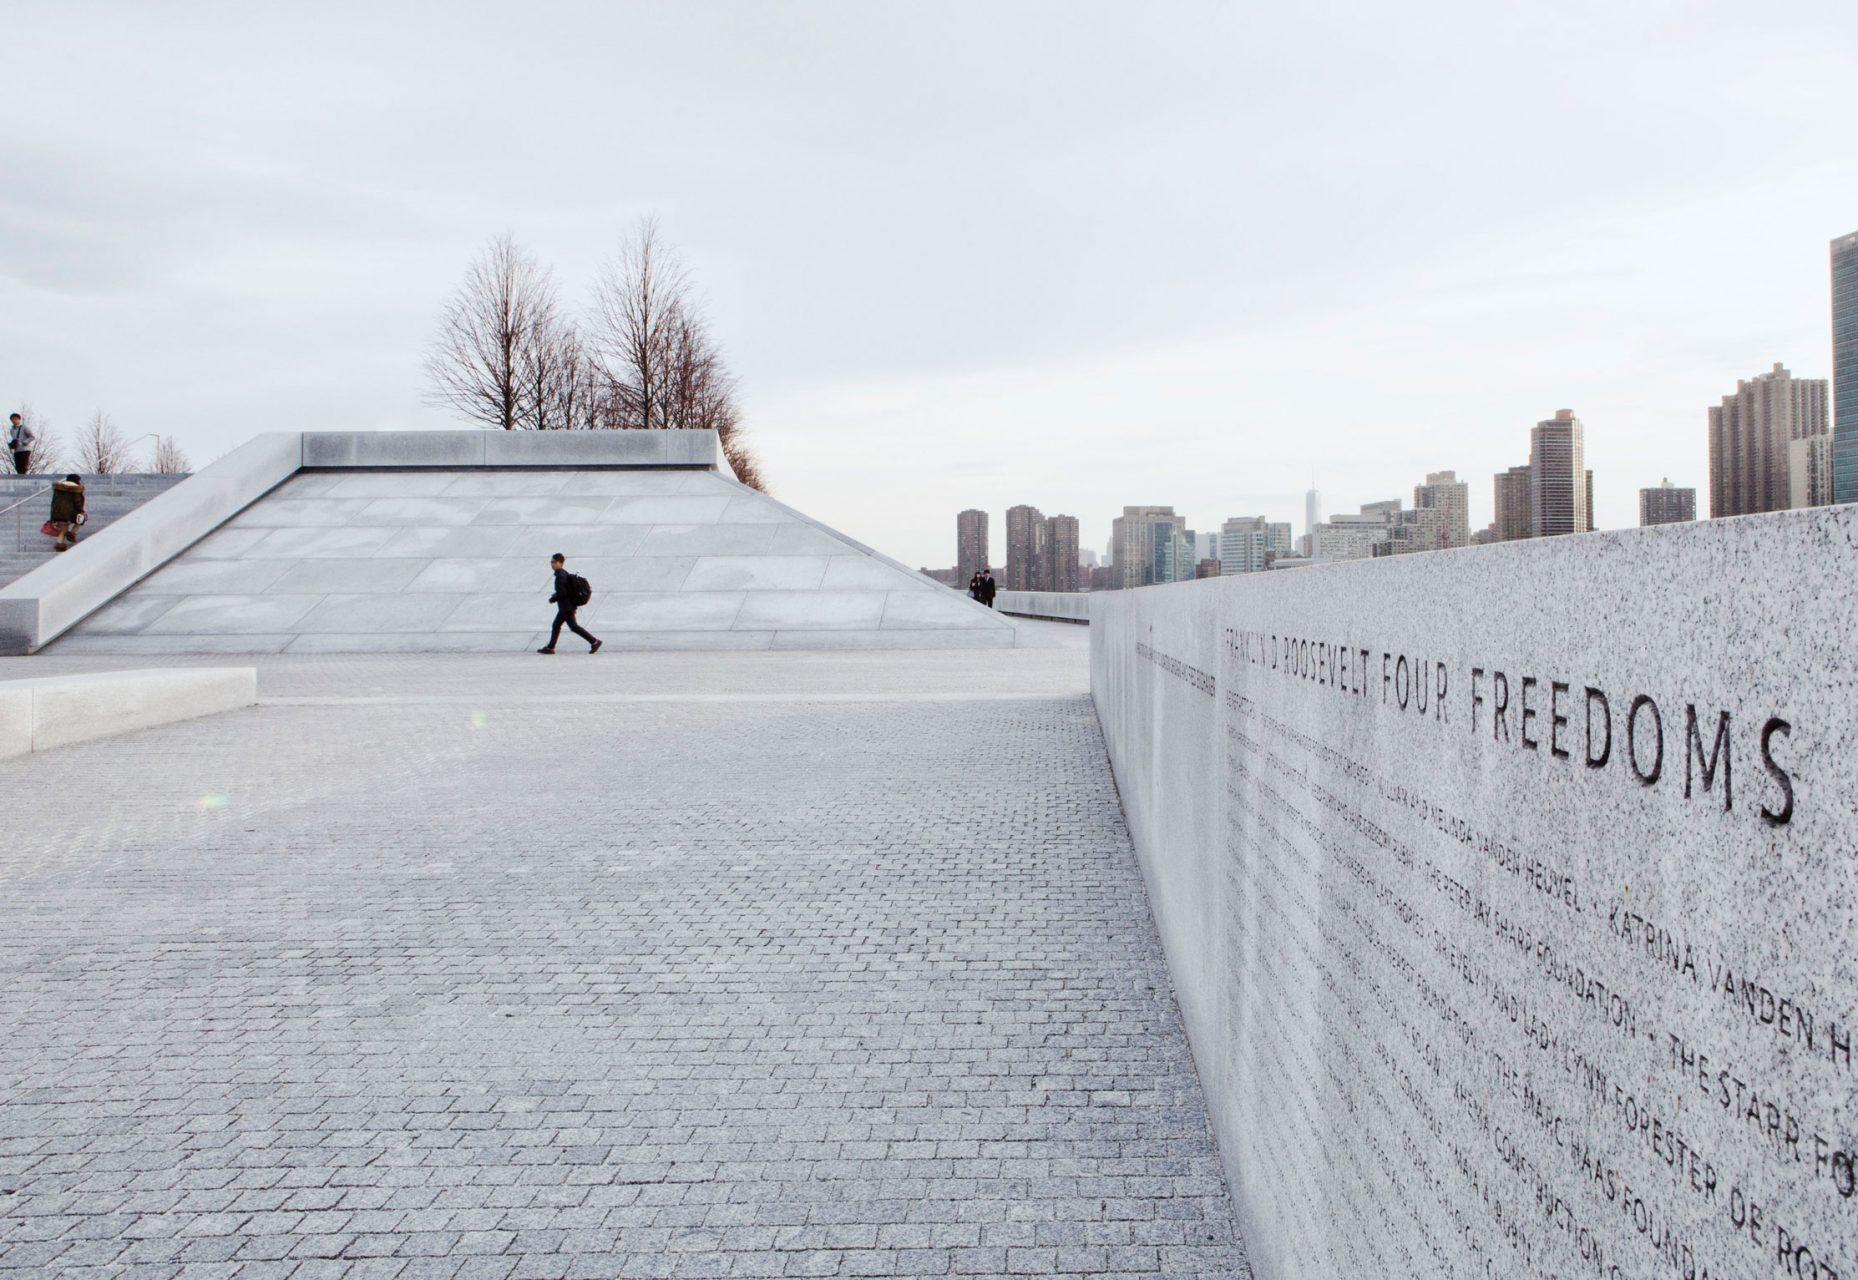 4 freedoms park